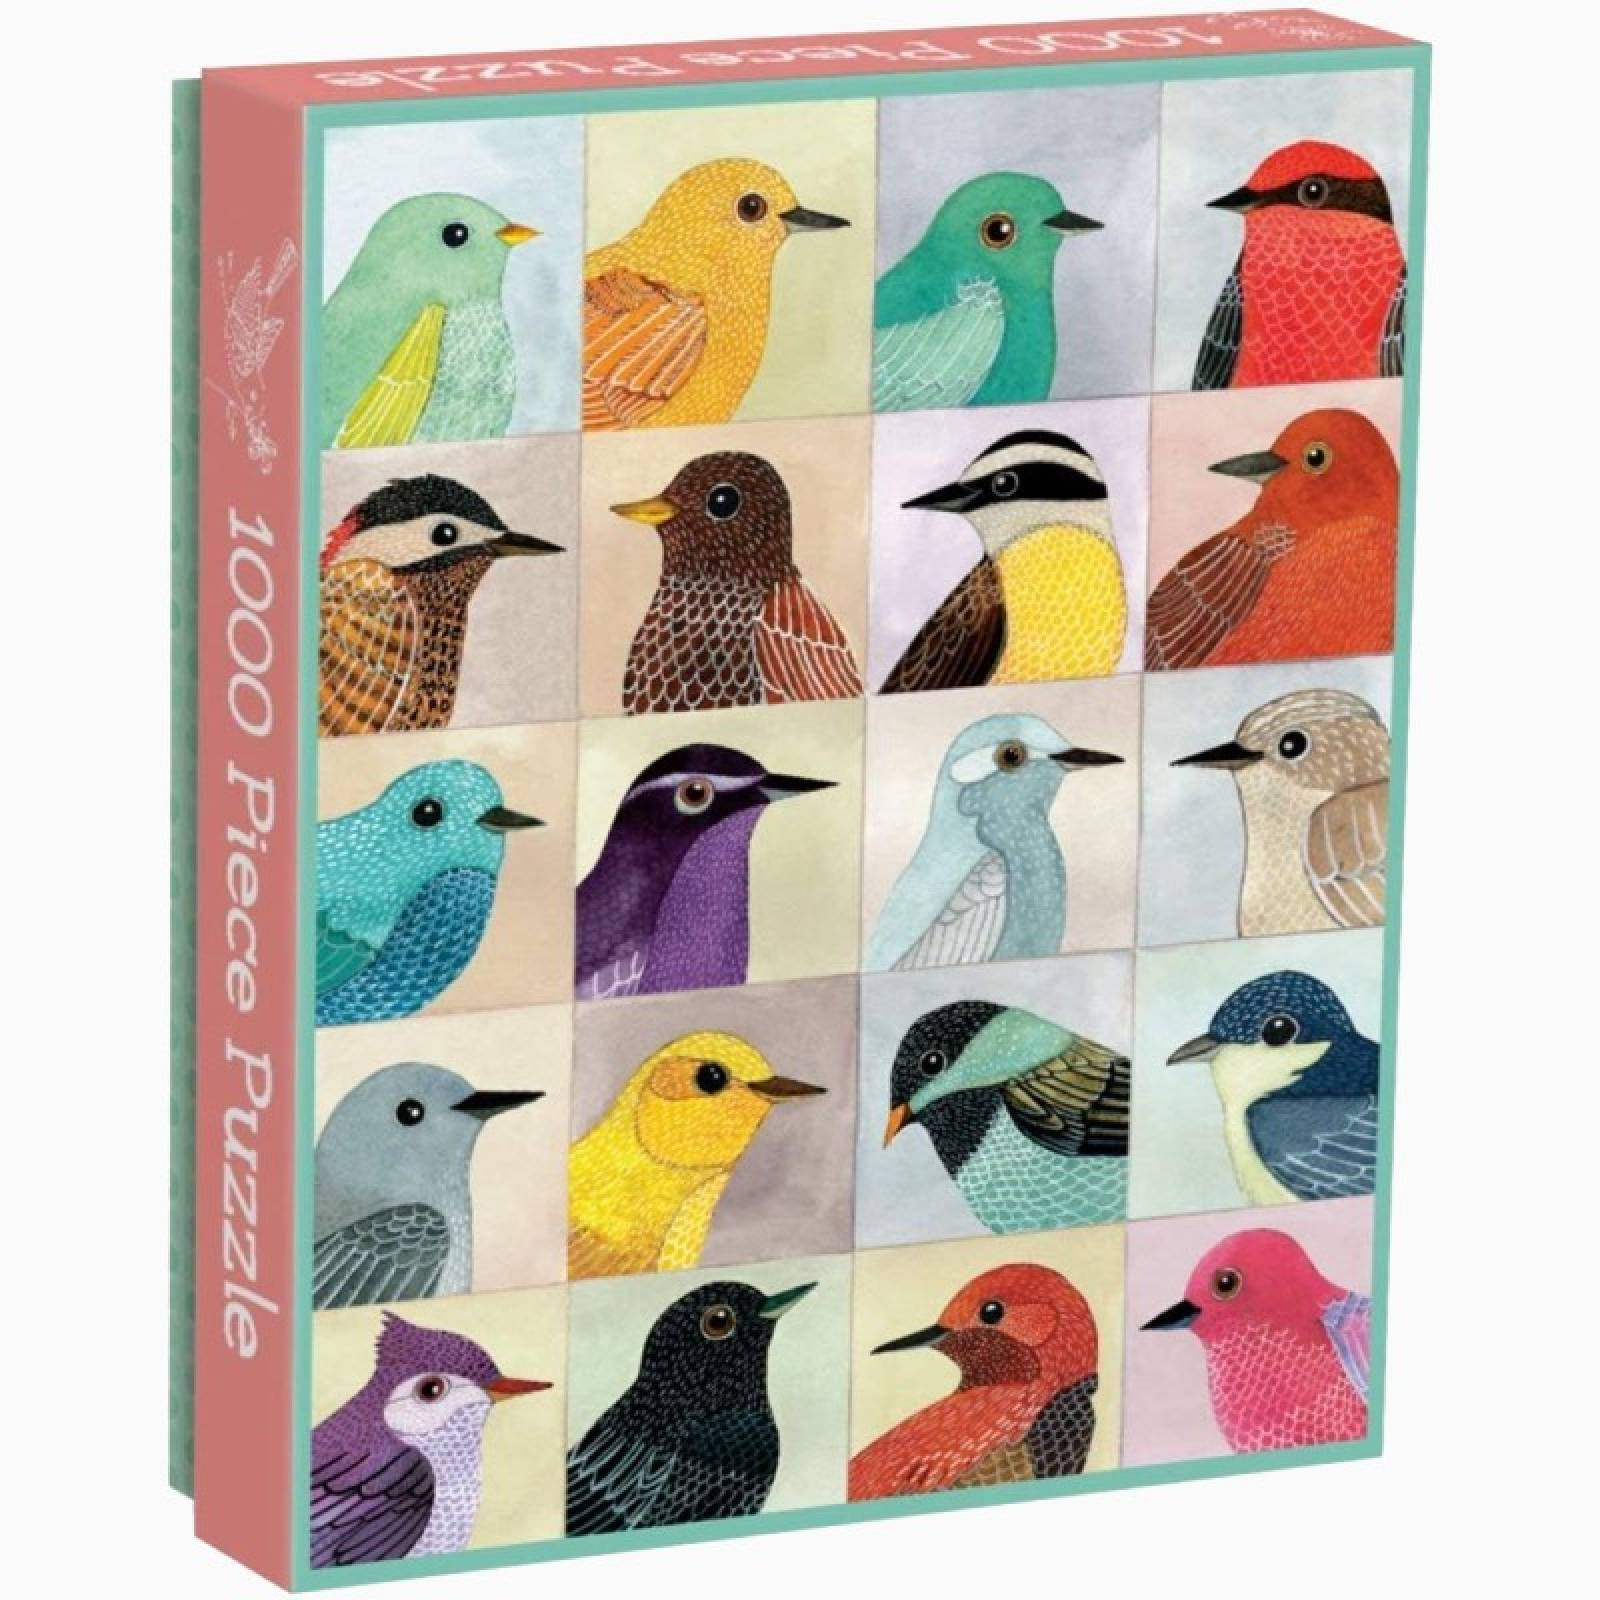 Avian Friends - 1000 Piece Jigsaw Puzzle